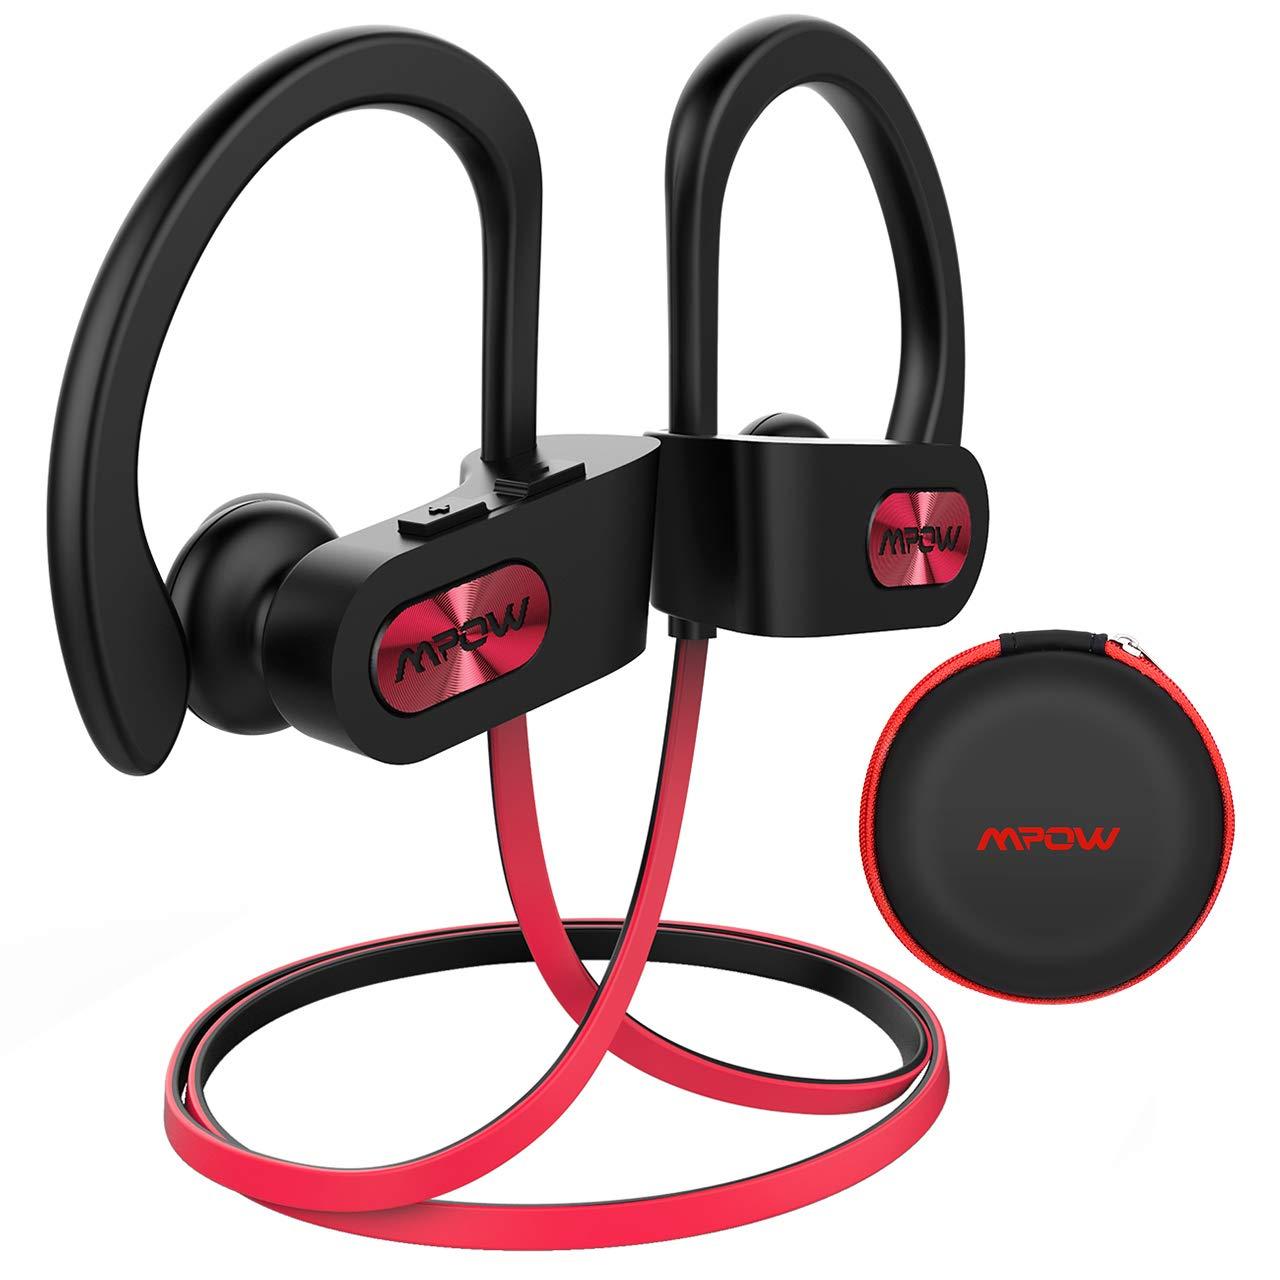 Mpow Flame Cuffie Bluetooth 4.1 Sport IPX7